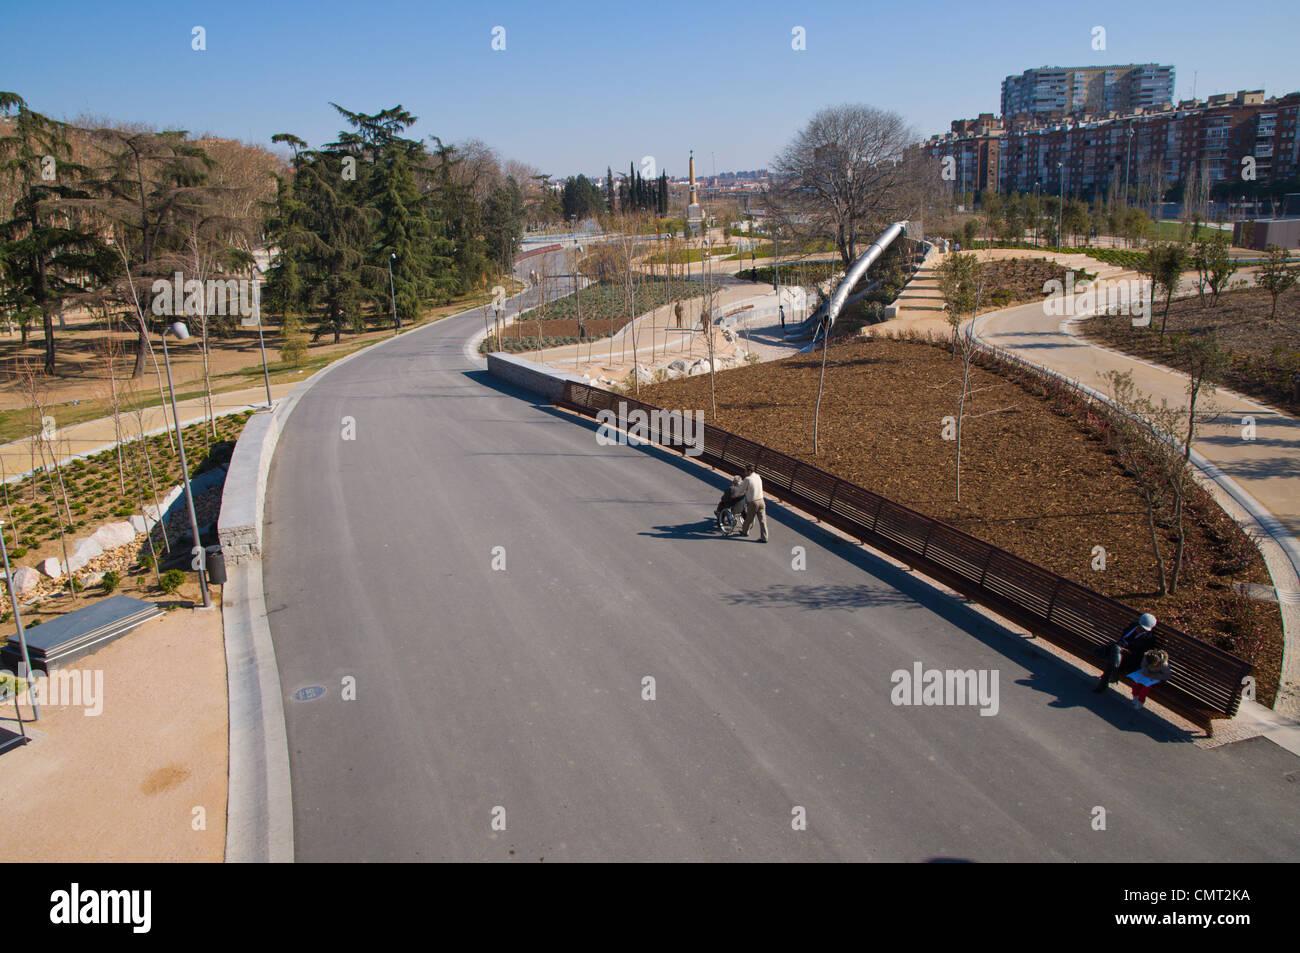 Madrid Rio new parkland recreational area around River Manzanares Madrid Spain Europe Stock Photo